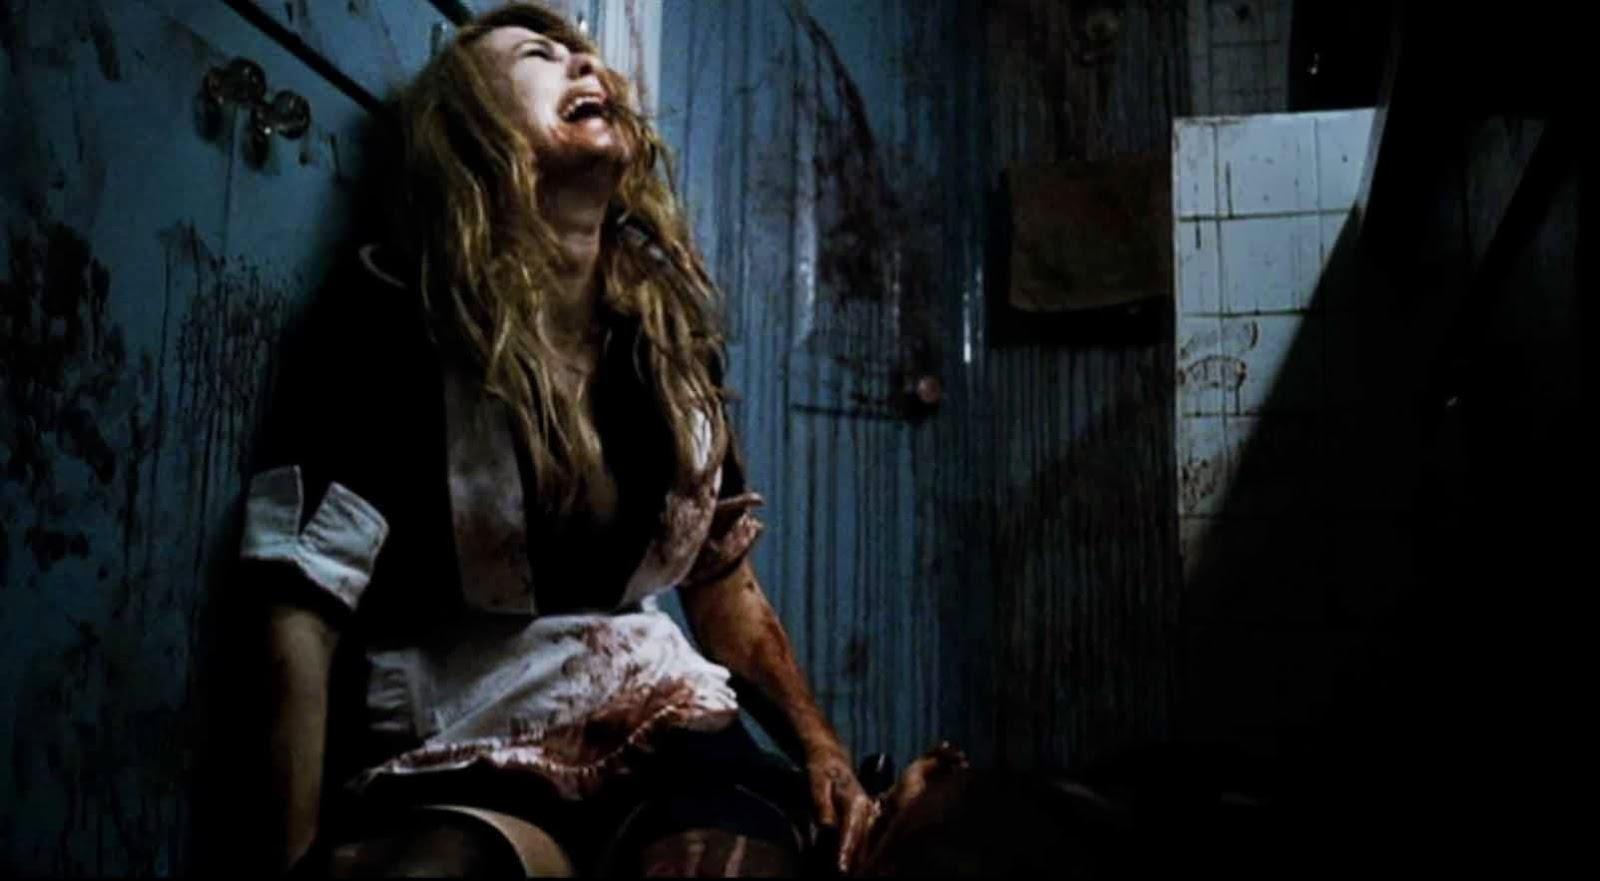 Naptown Nerd: Halloween II: A Rob Zombie Film (2009) - Guest Article